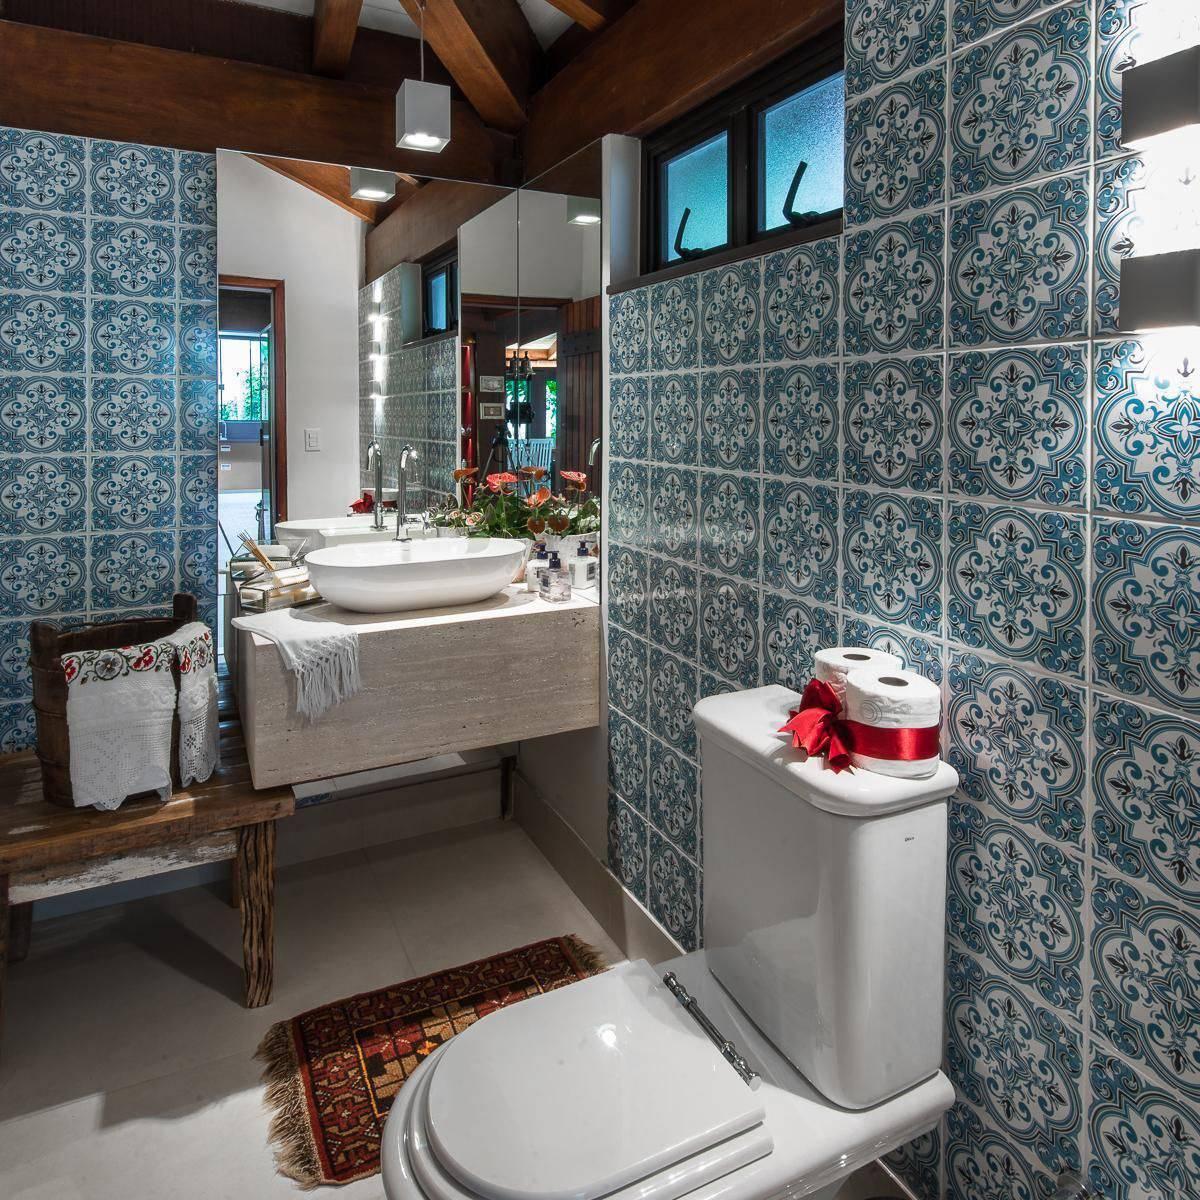 vaso sanitario banheiro camila tannous 56640